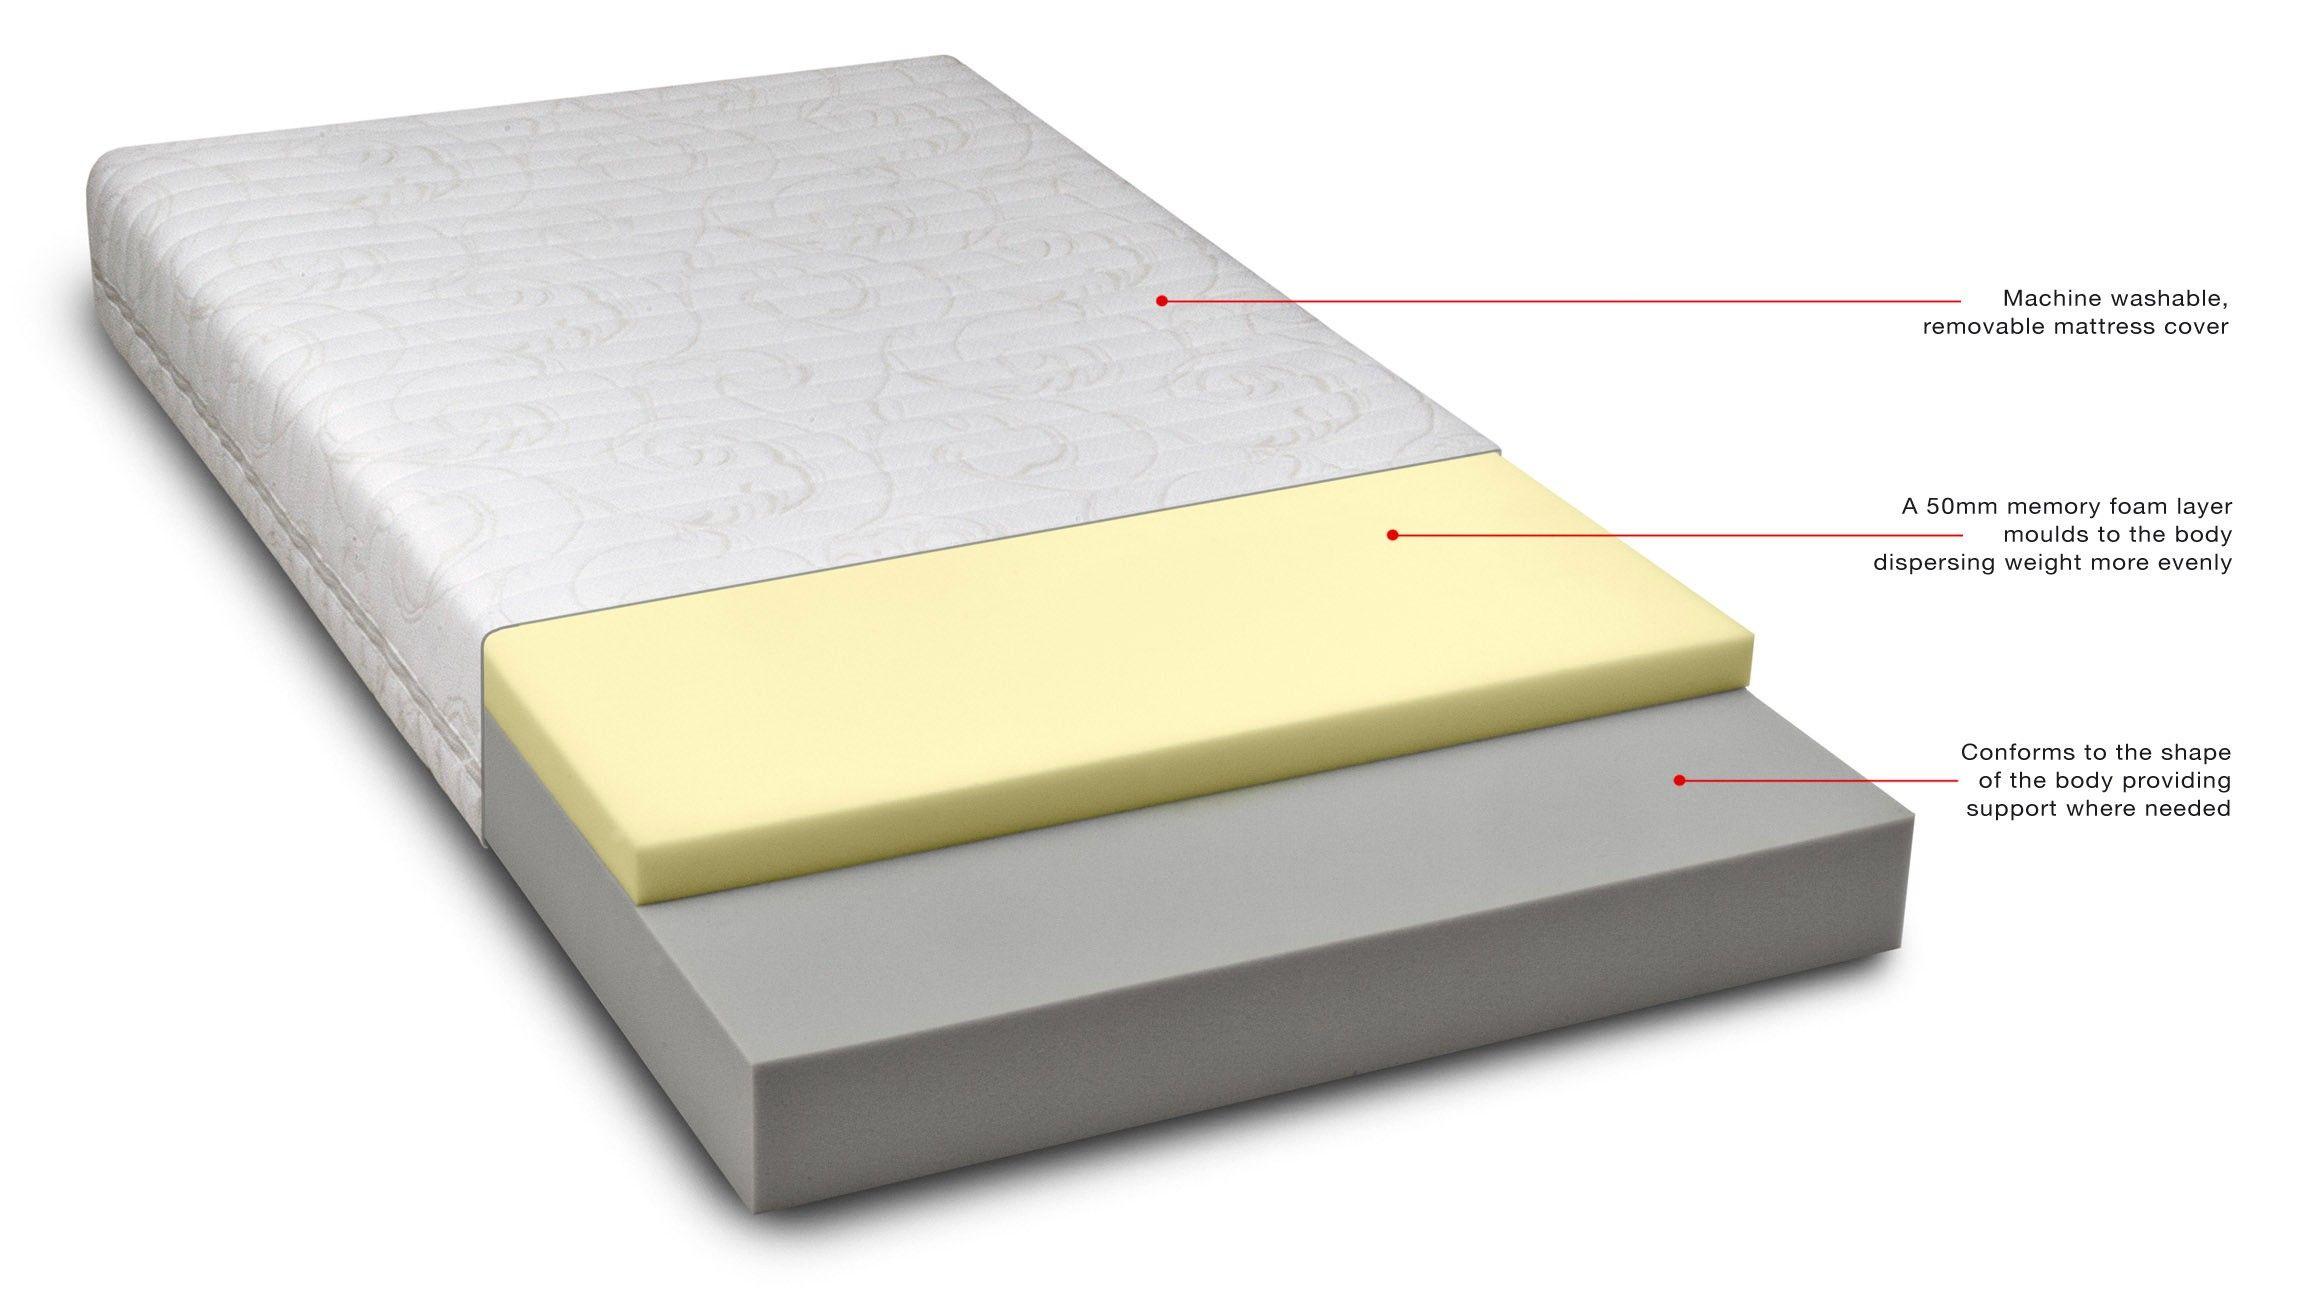 restonic bed mattress evaluations all about mattresses pinterest